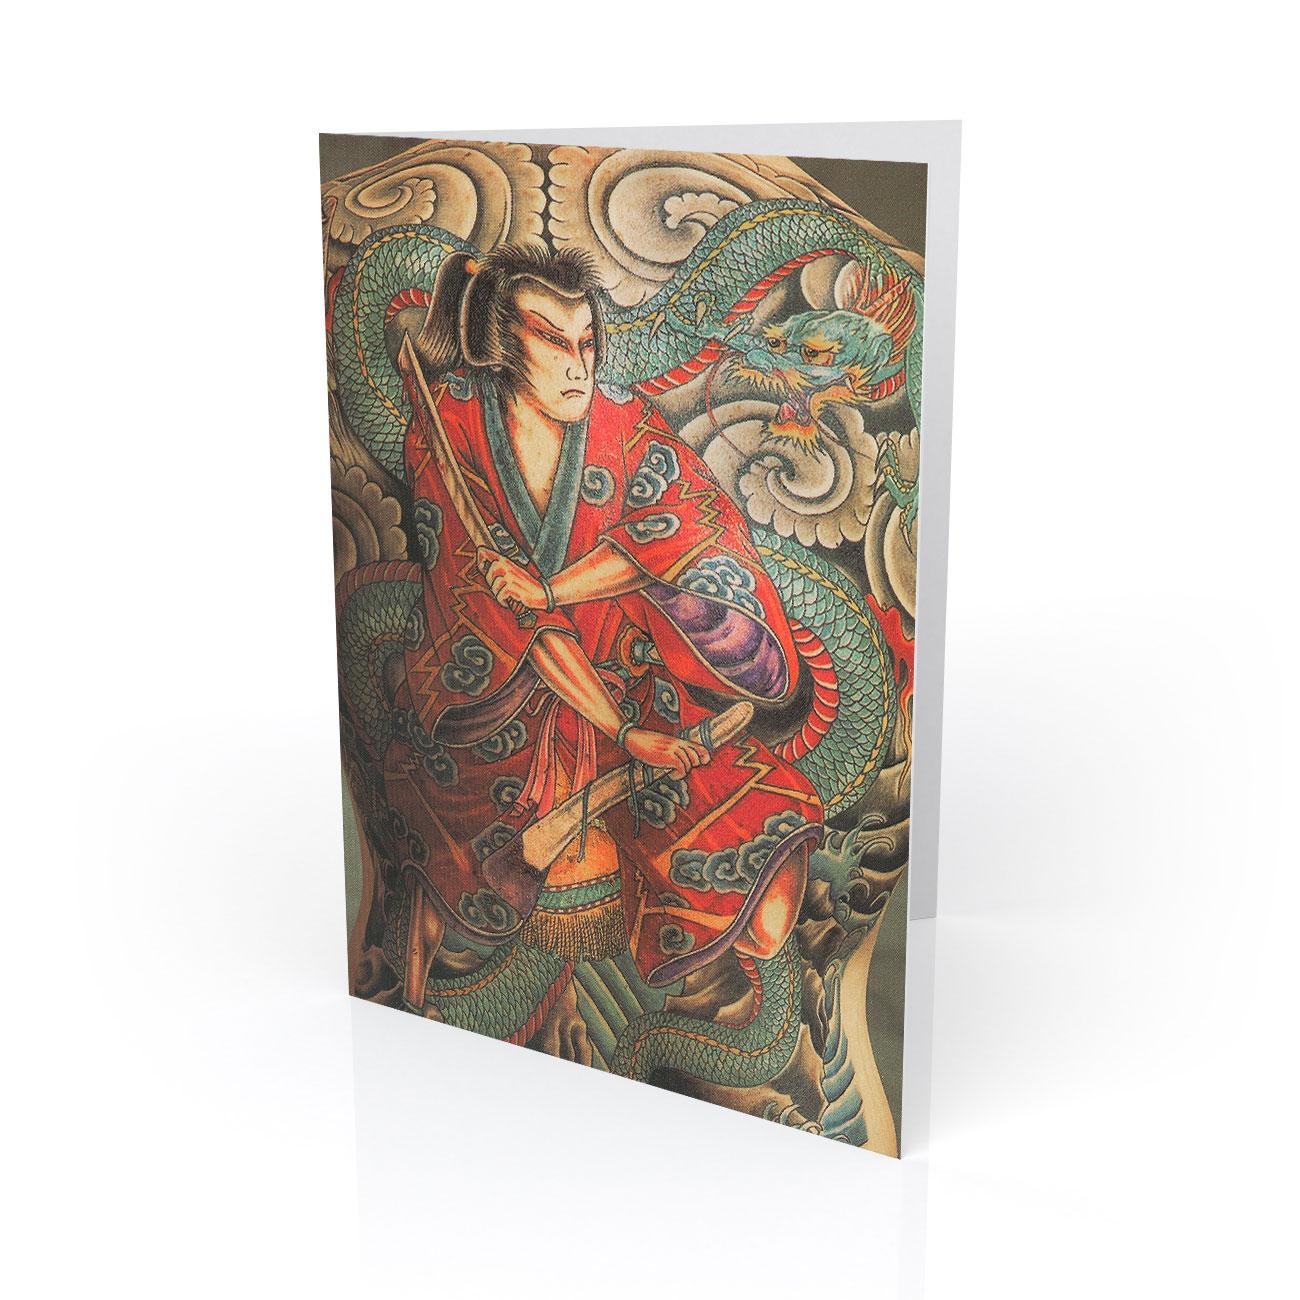 Homage to hori yoshi ll greeting card tattoo artcards homage to hori yoshi ll greeting card tattoo artcards m4hsunfo